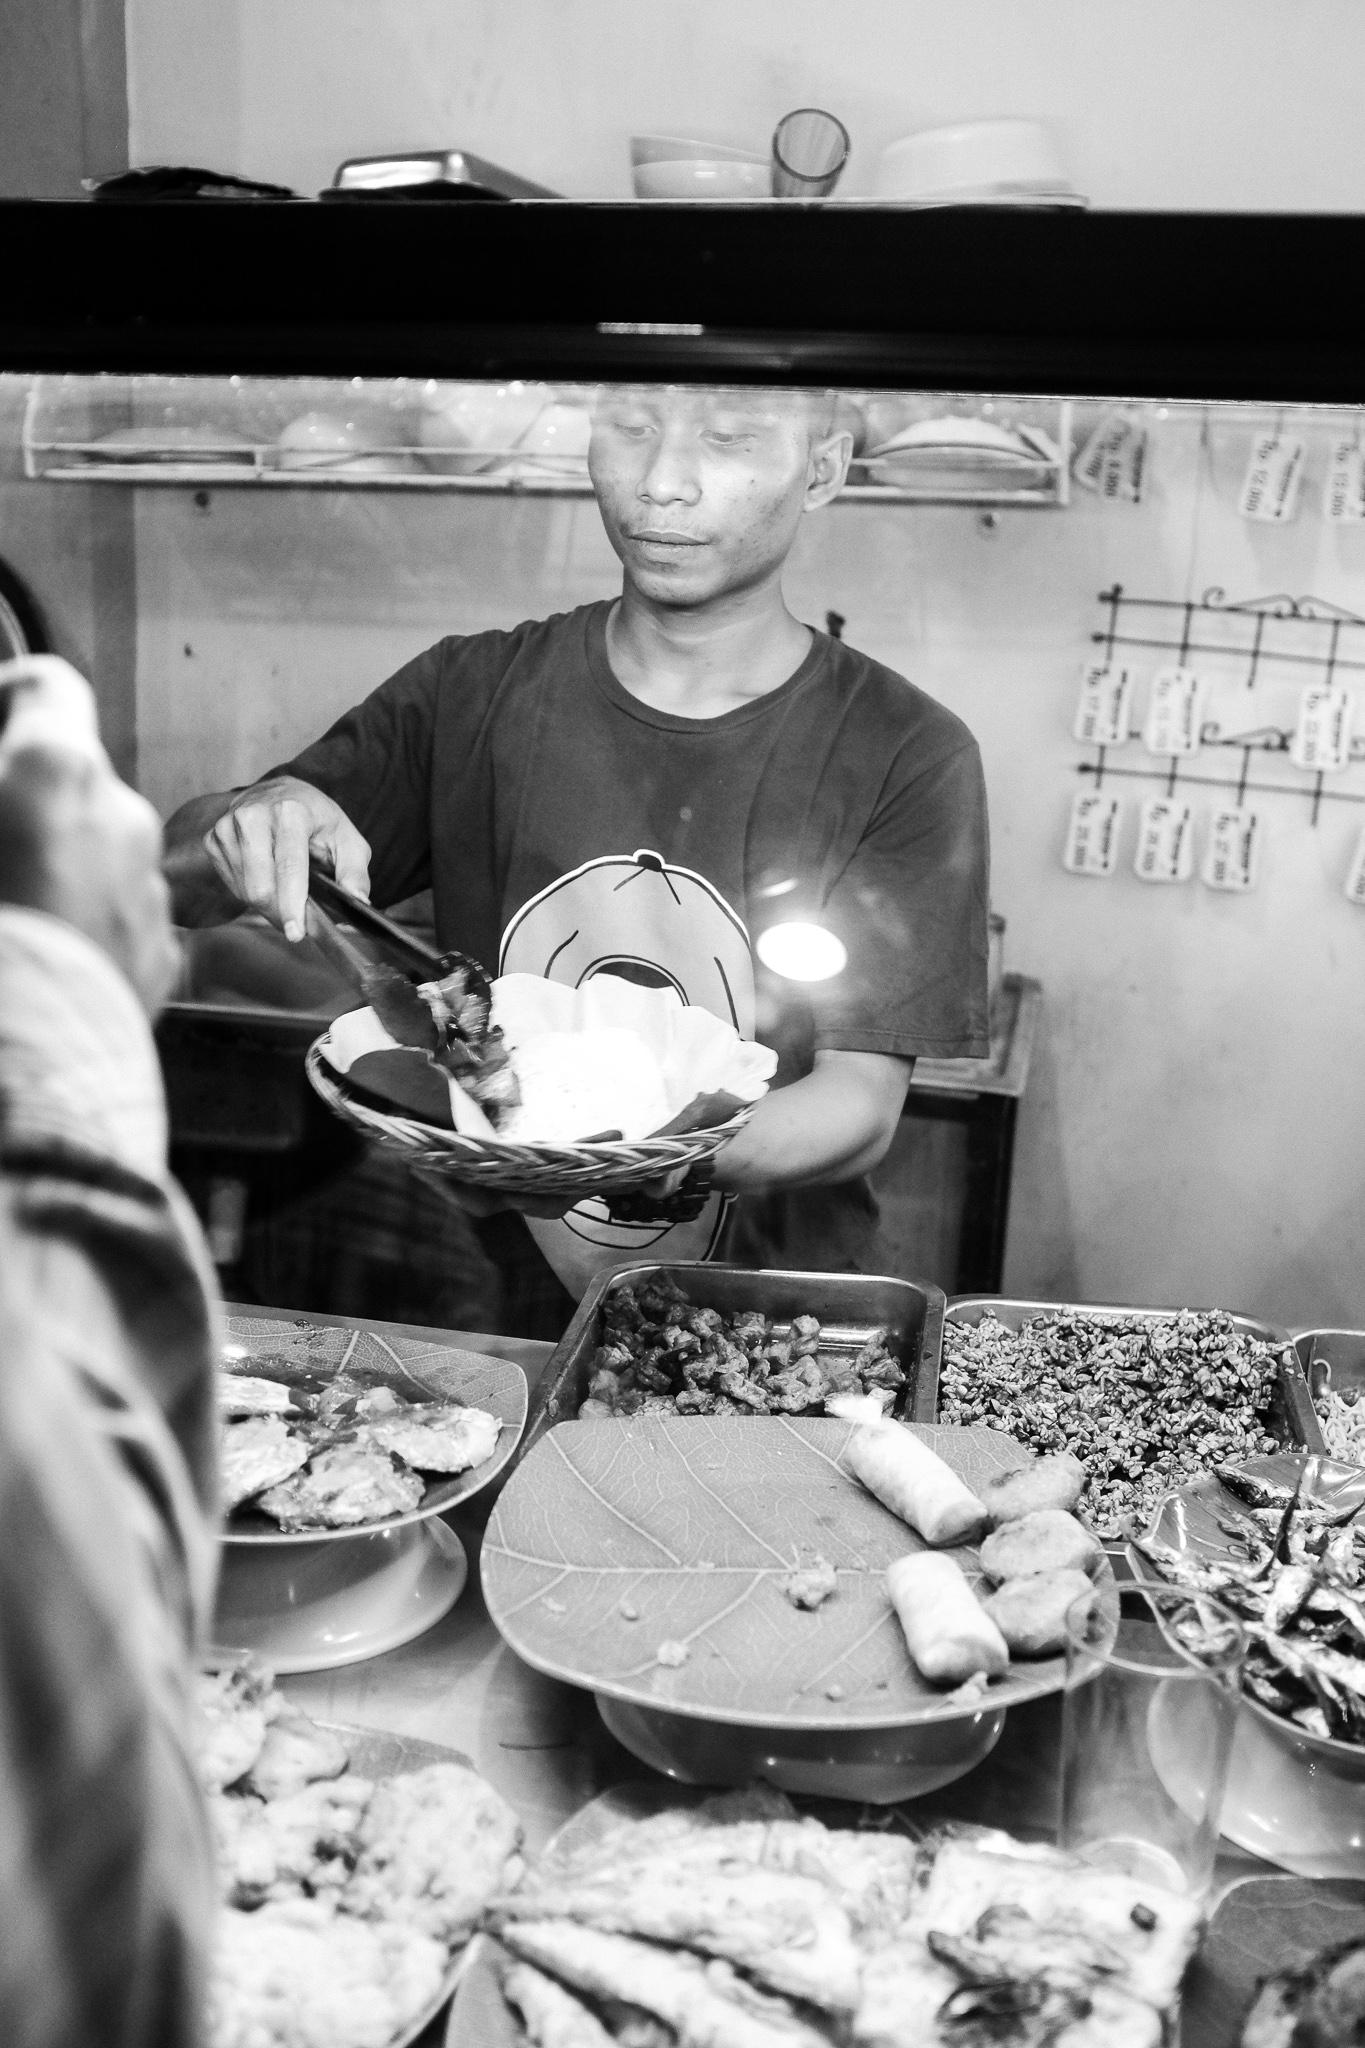 Padang Maskan Indonesian food - Bali Street Photographer